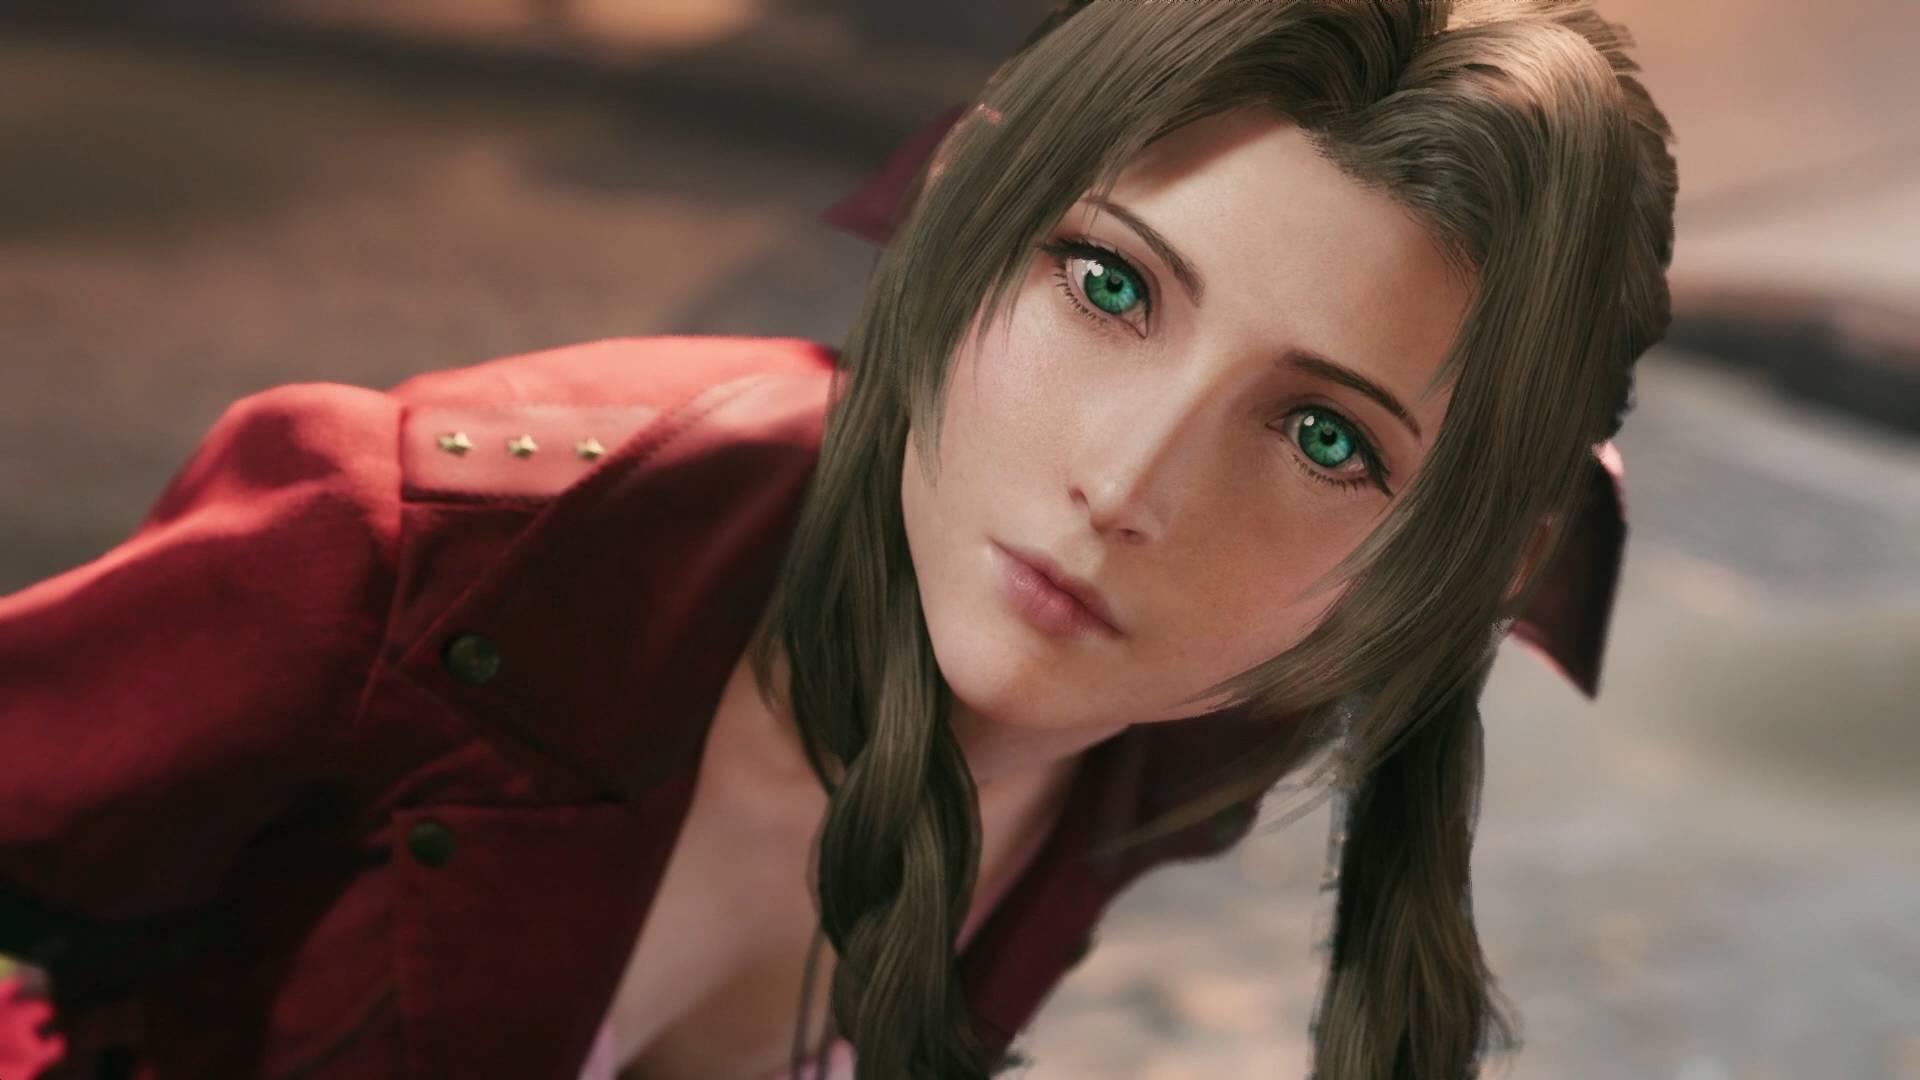 Final Fantasy VII 7 remake